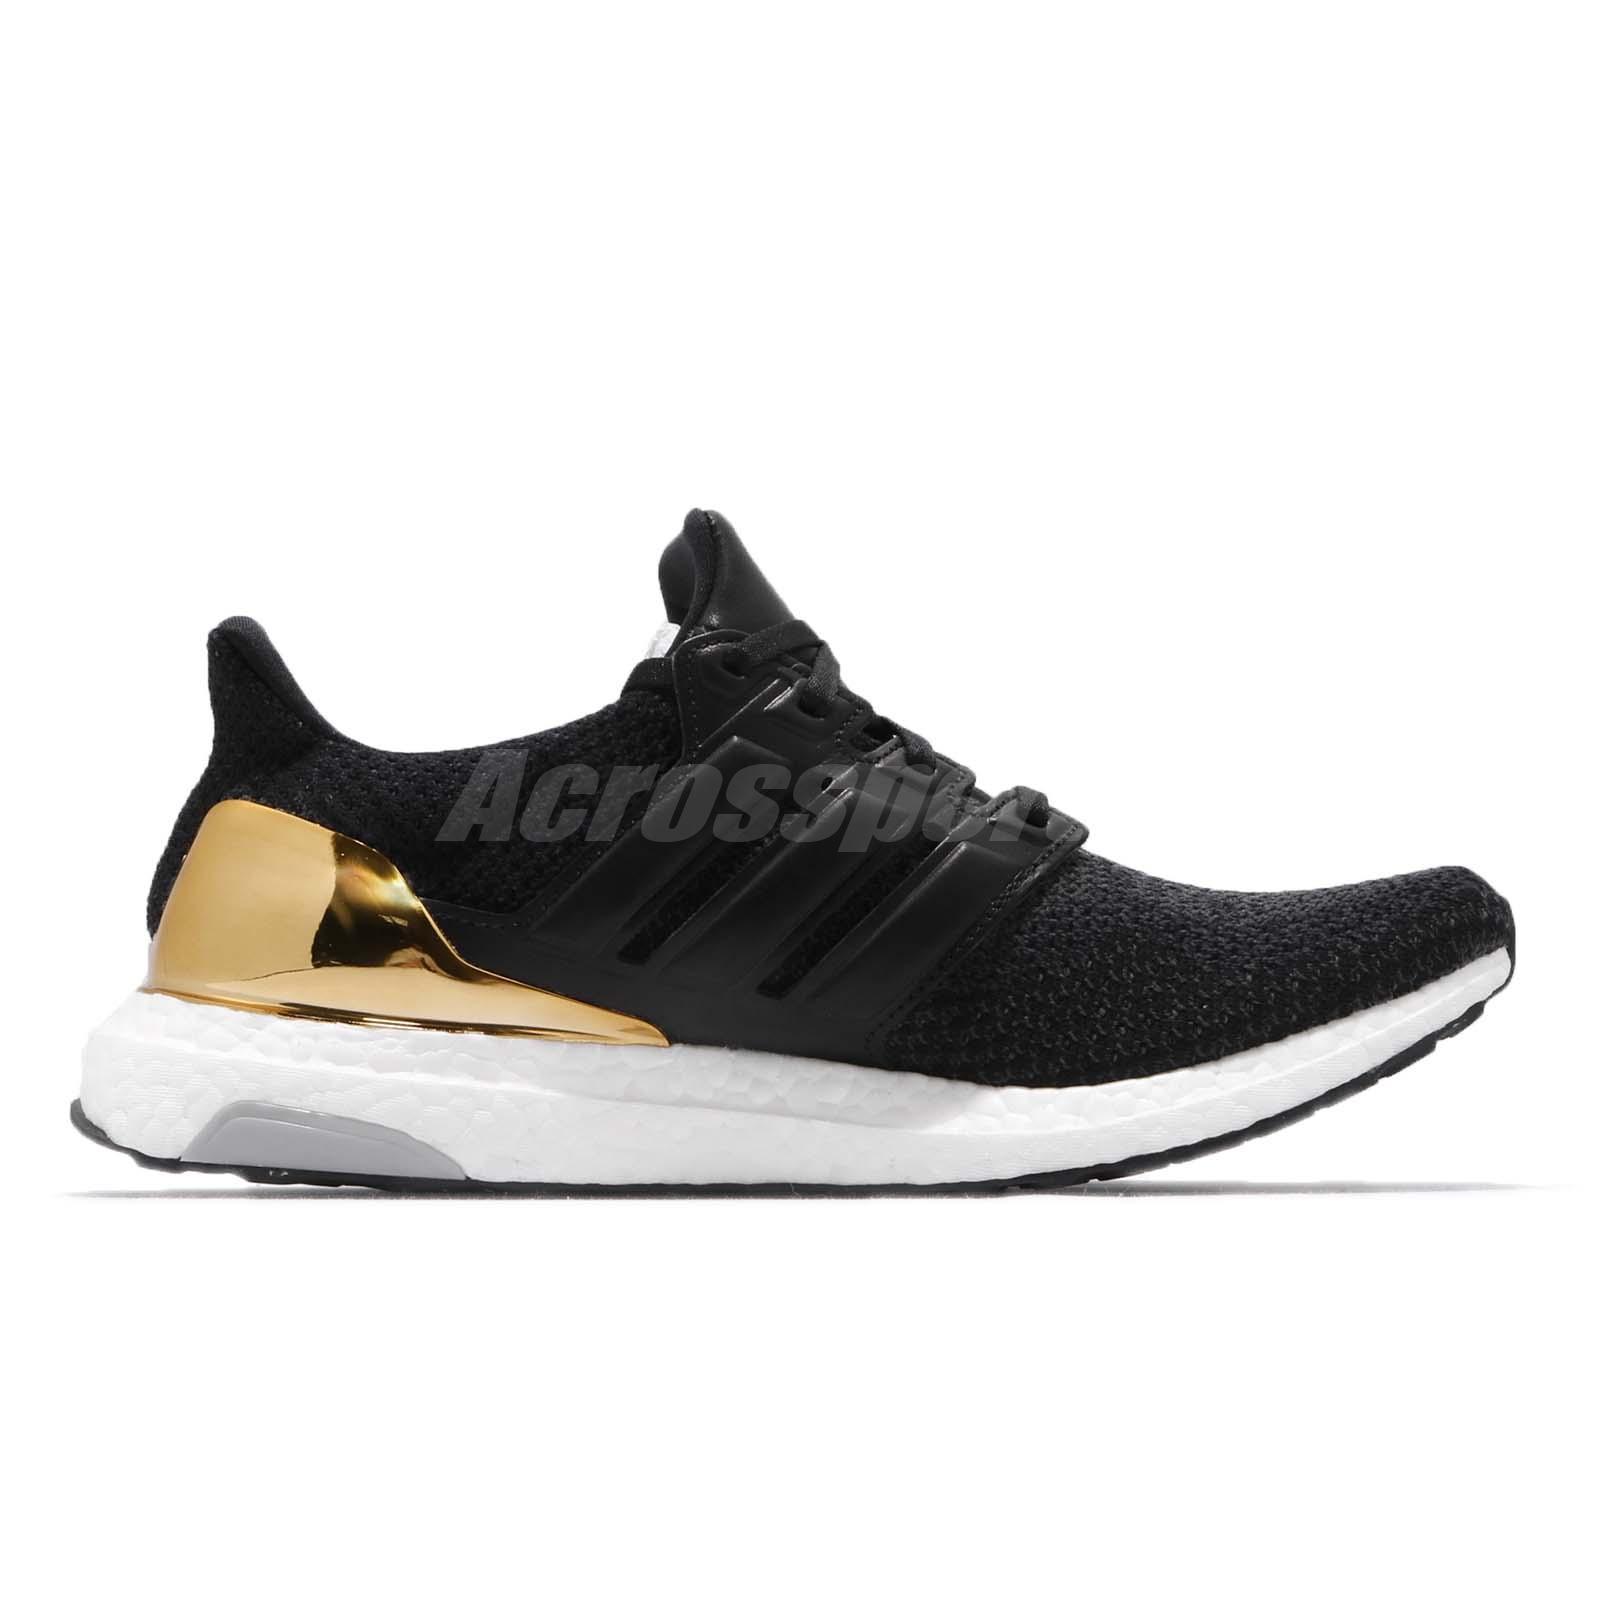 dc08136e955b9 adidas UltraBOOST LTD Olympic Gold Medal Black Mens Womens Running ...